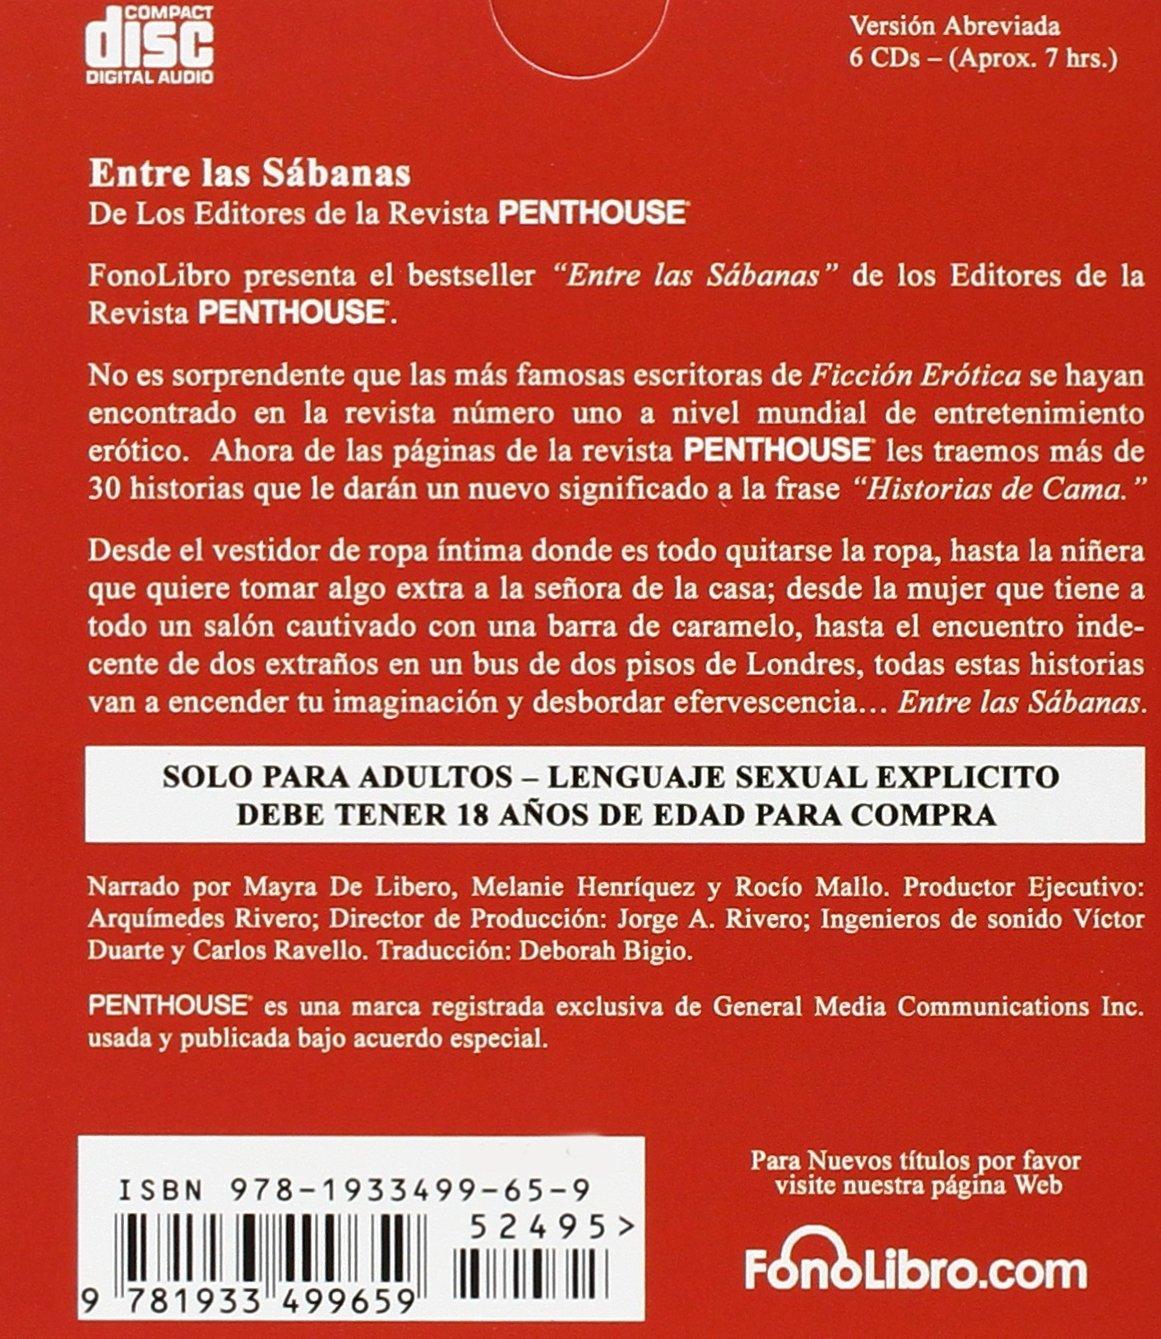 Amazon.com: Penthouse: Entre las Sabanas (Spanish Edition) (9781933499659): Penthouse International: Books